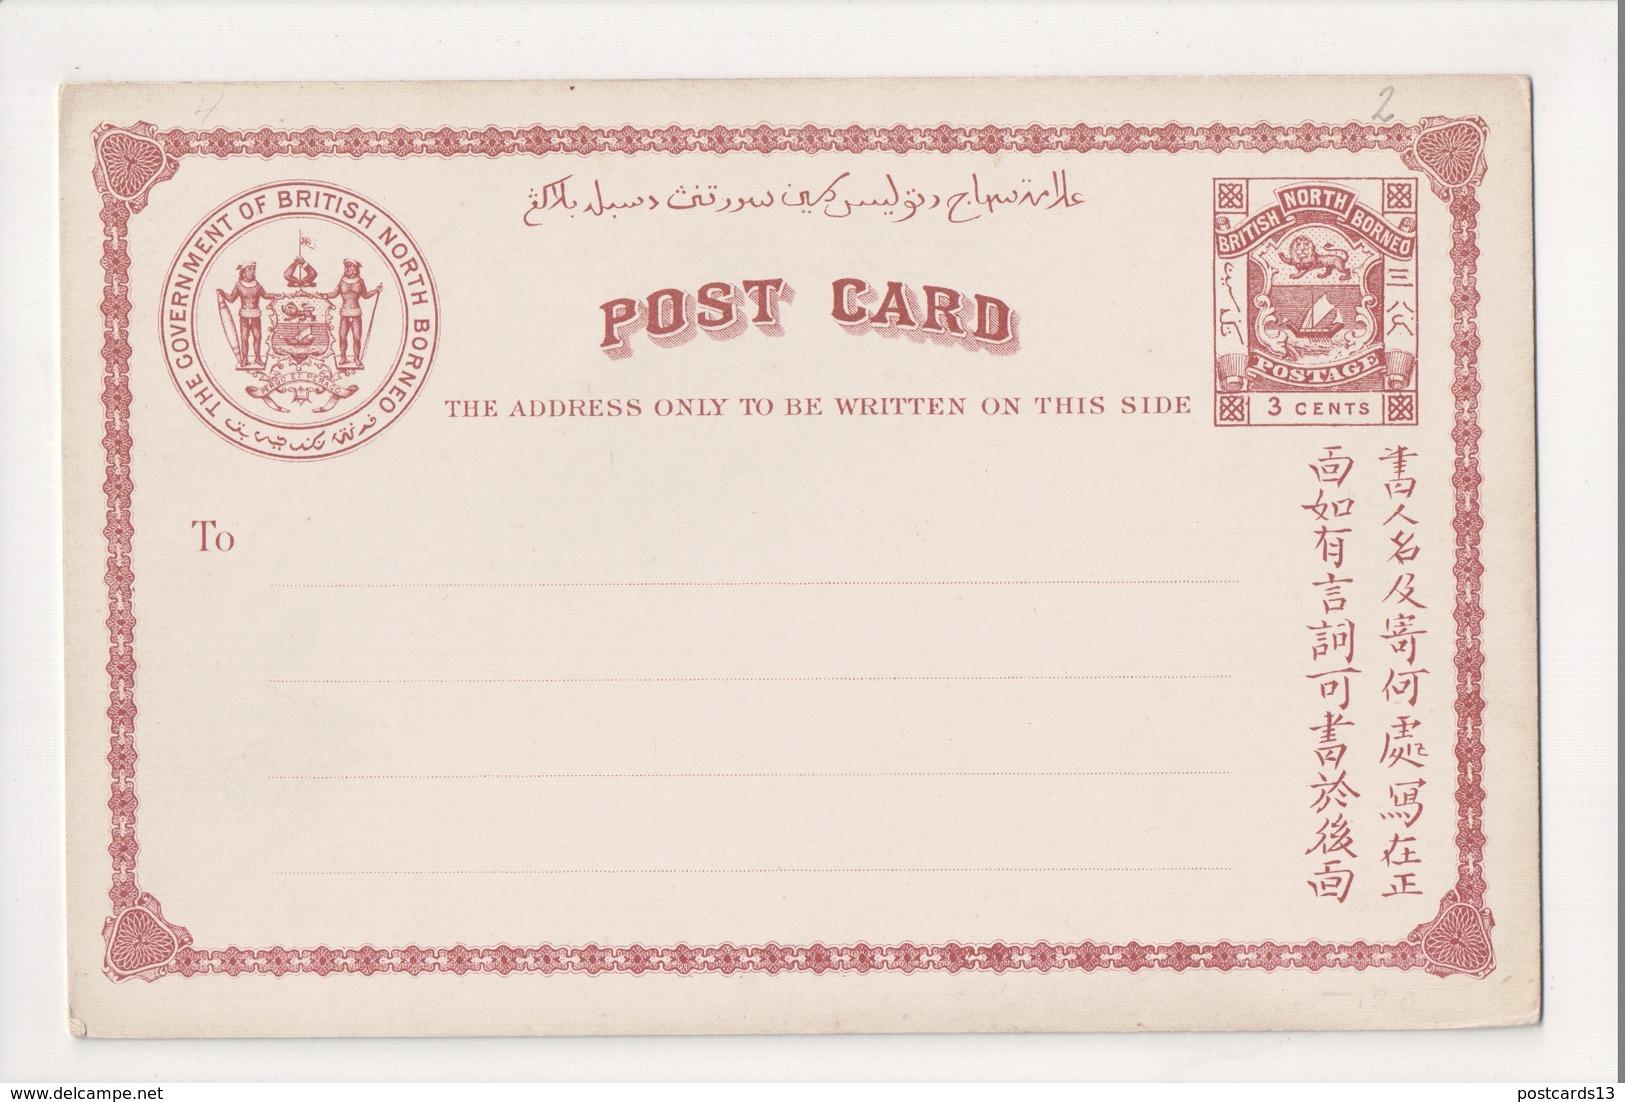 J-811 British North Borneo 3 Cent Postage Postal Card Postcard Unused - Postcards